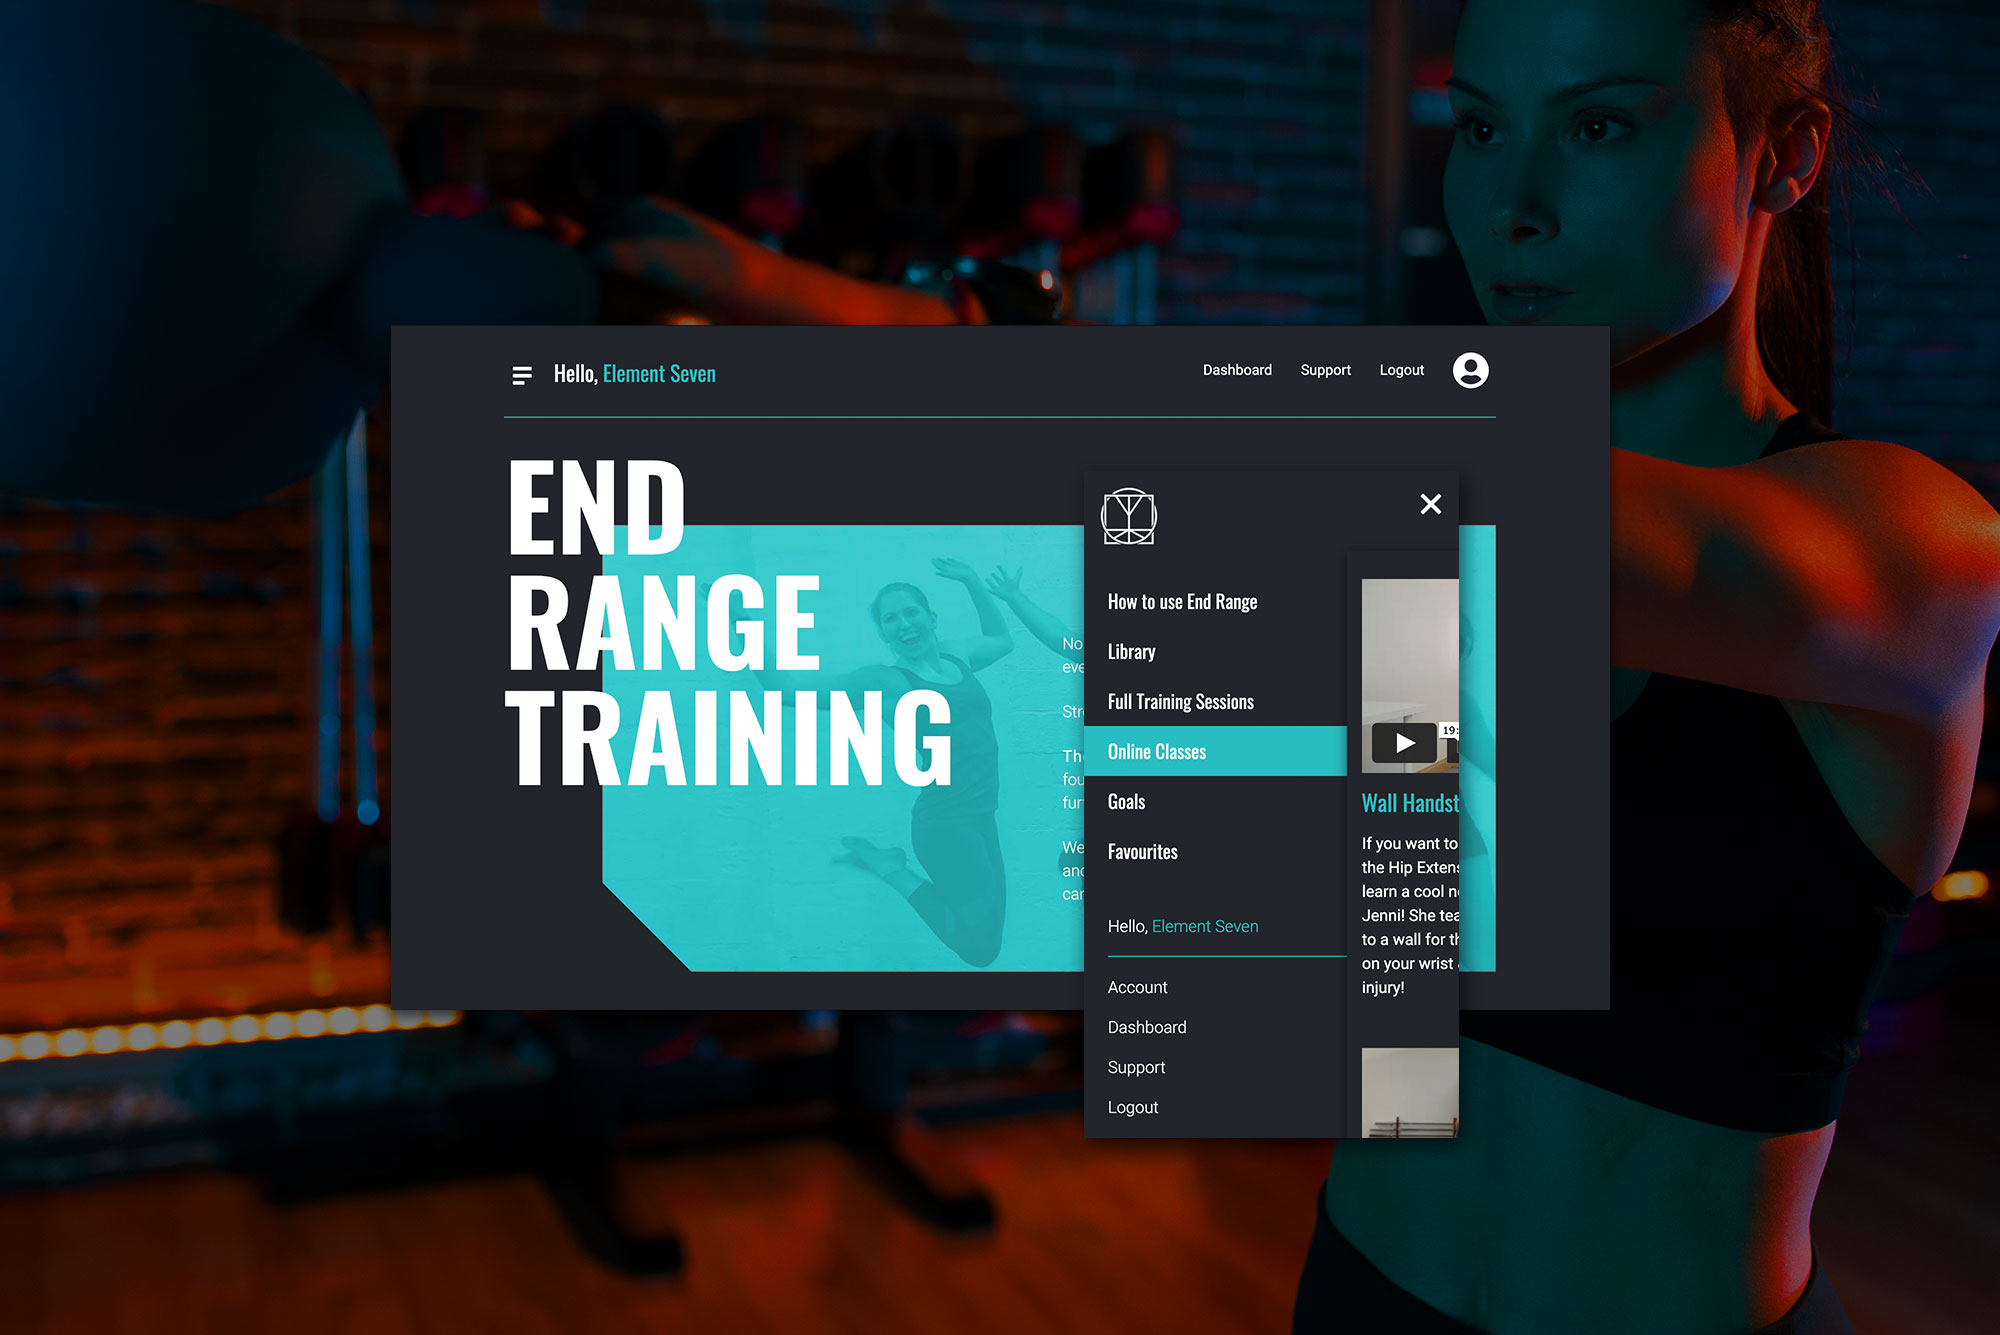 End Range Training